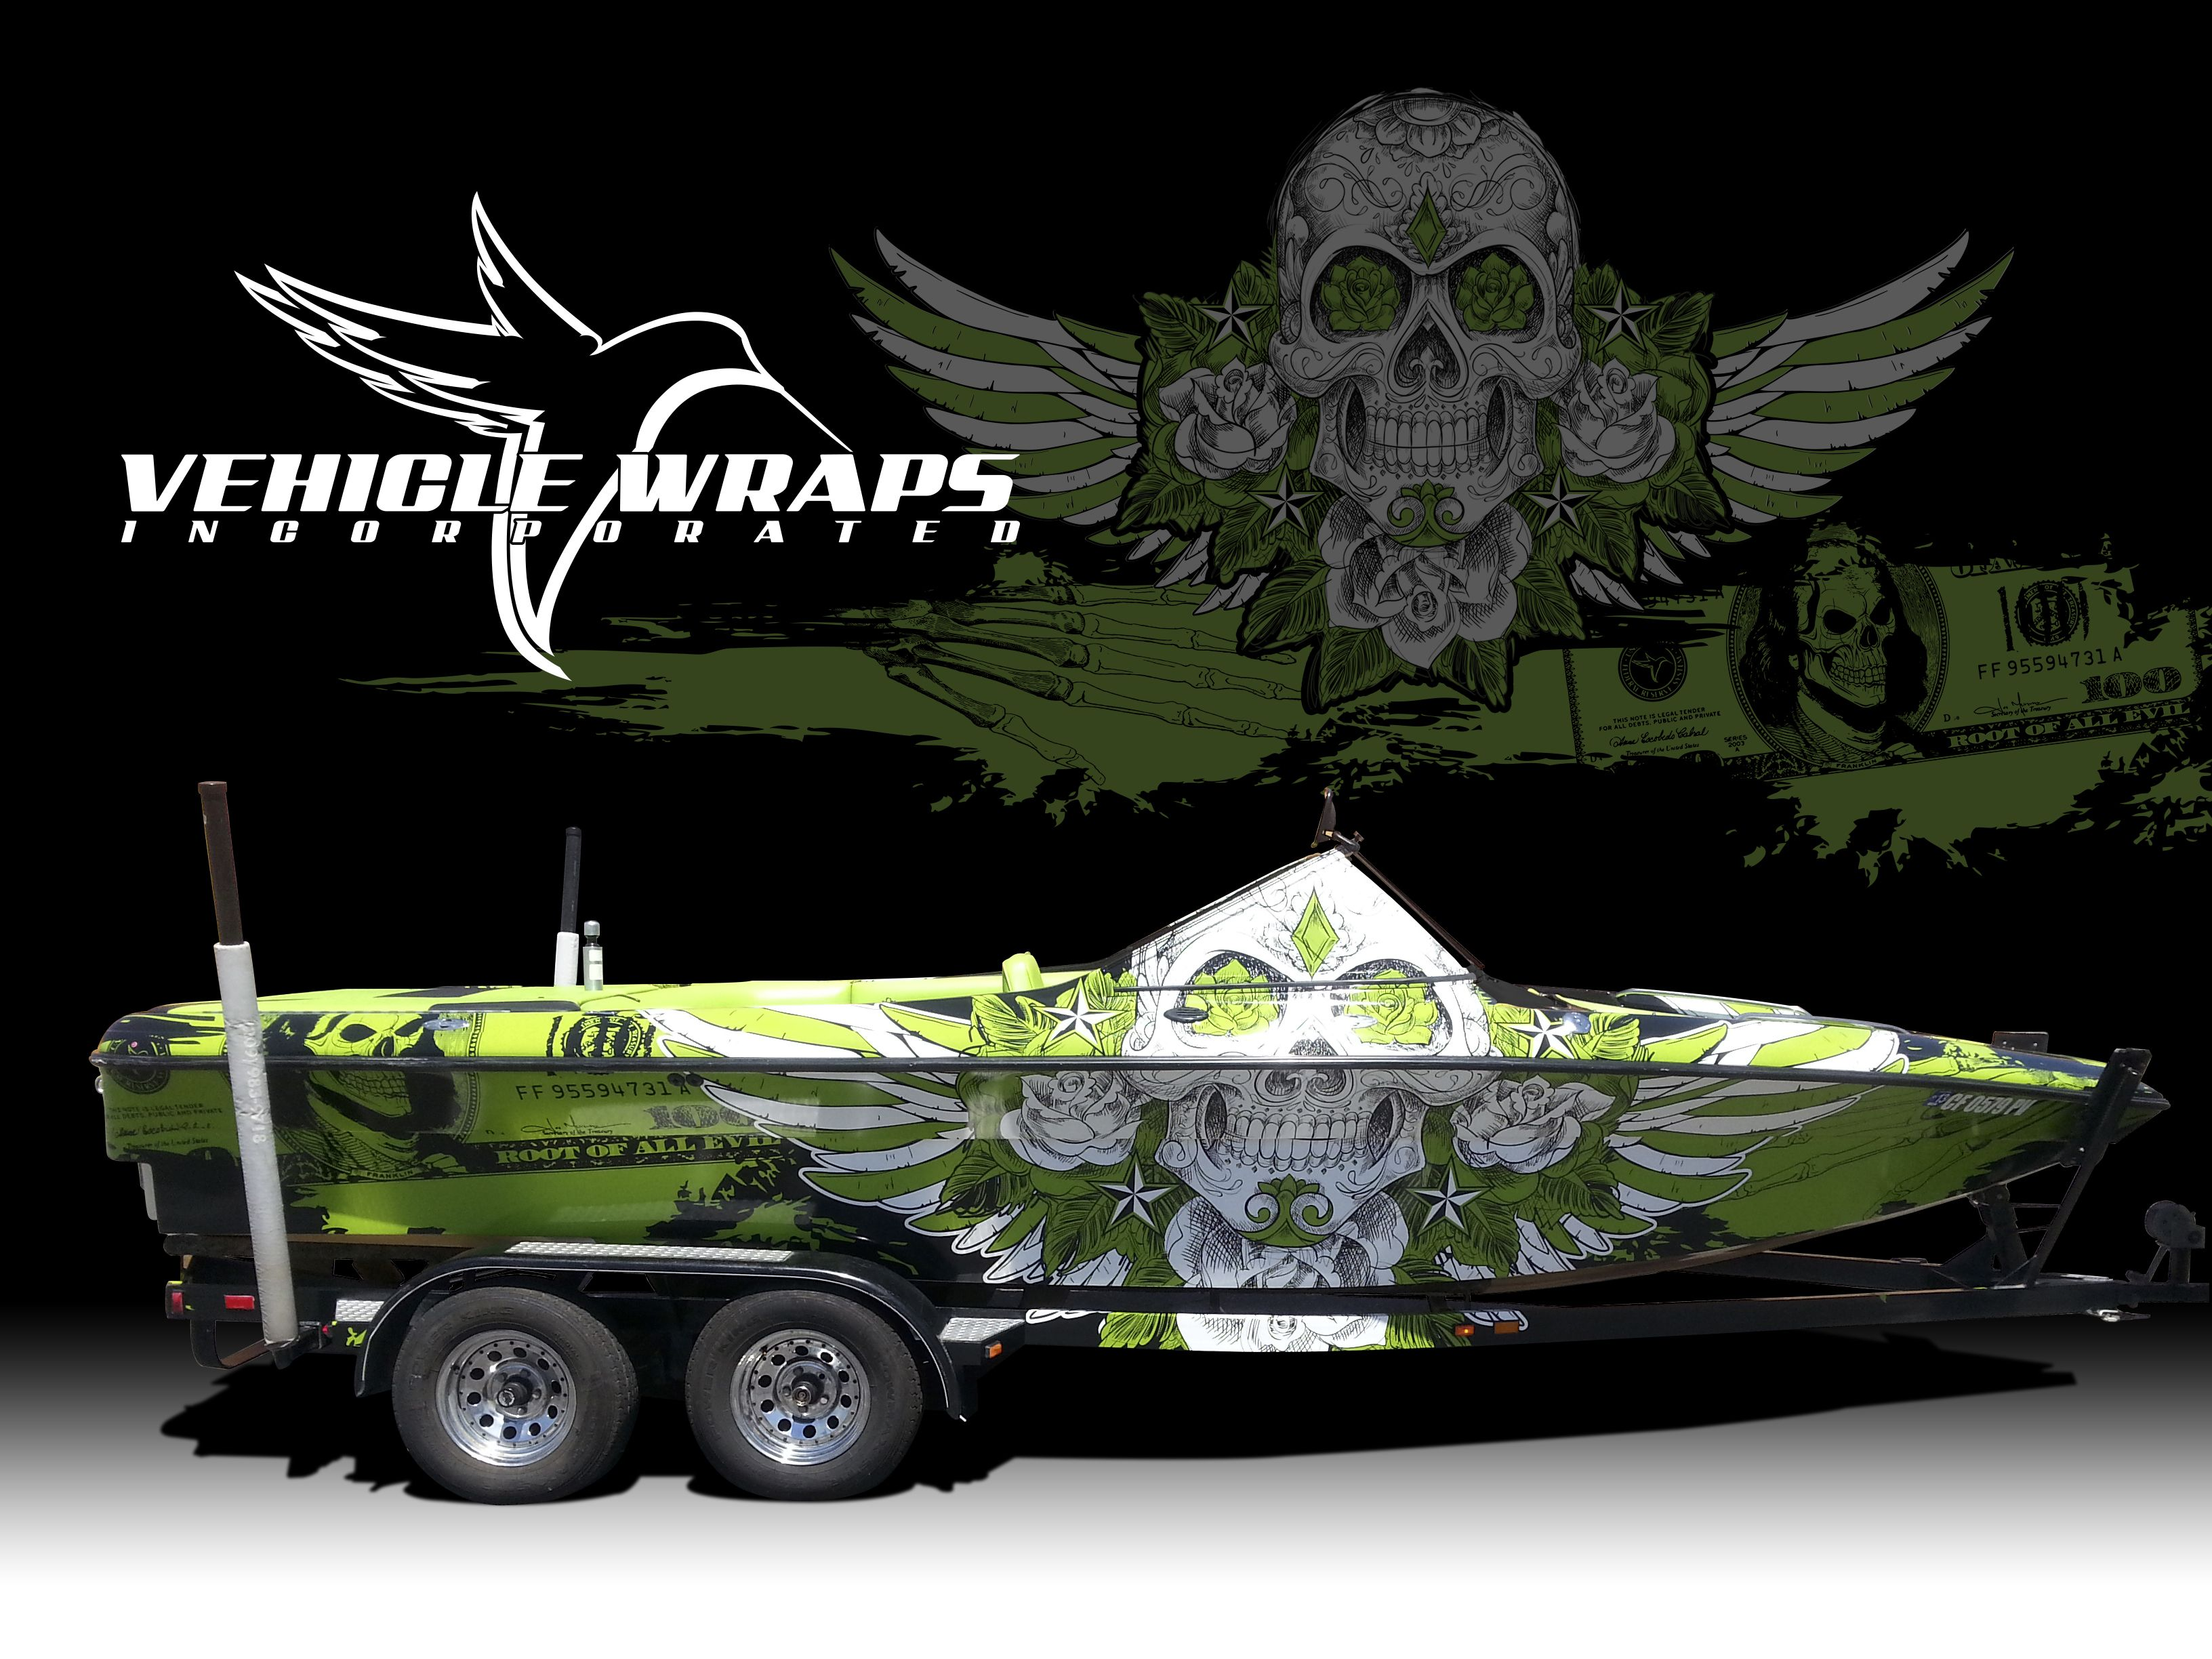 Vehicle Wraps Inc Sacramento California Vehicle Wrap Company Car Wrap Car Wrap Design Boat Wraps